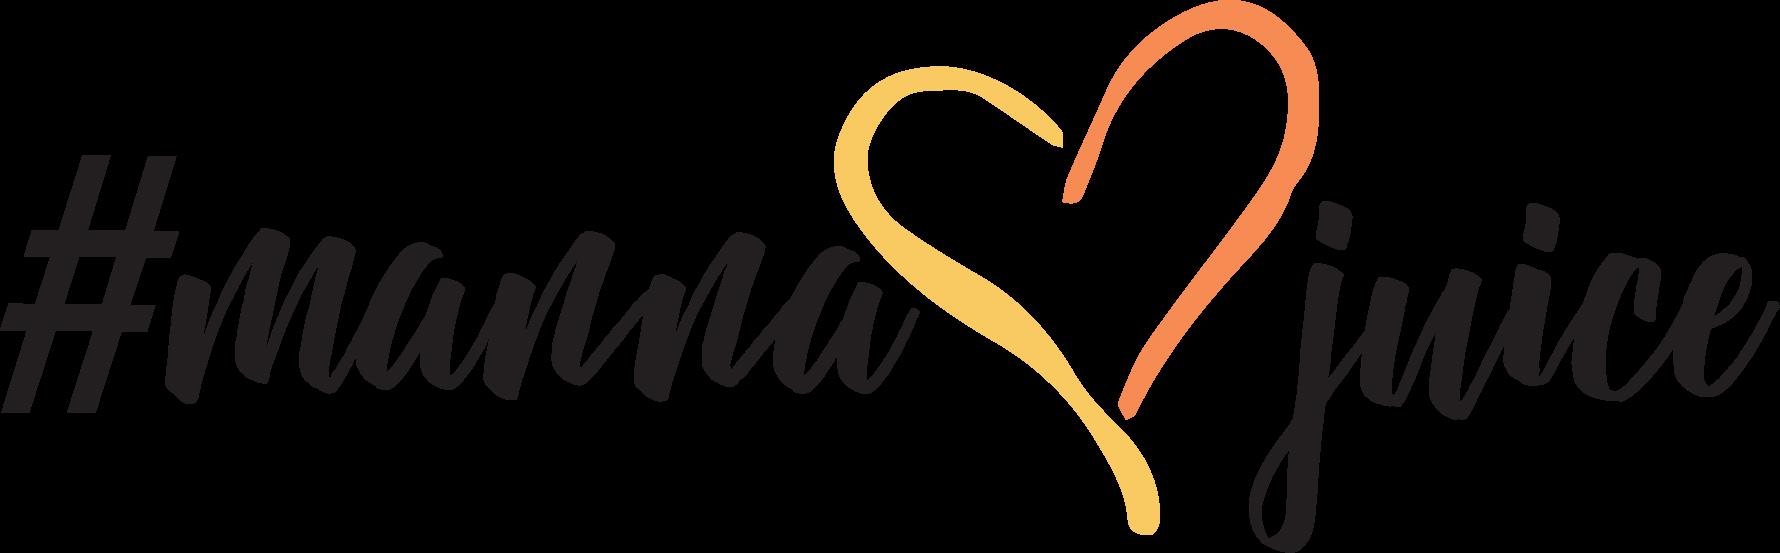 mannalovejuice_logo.png